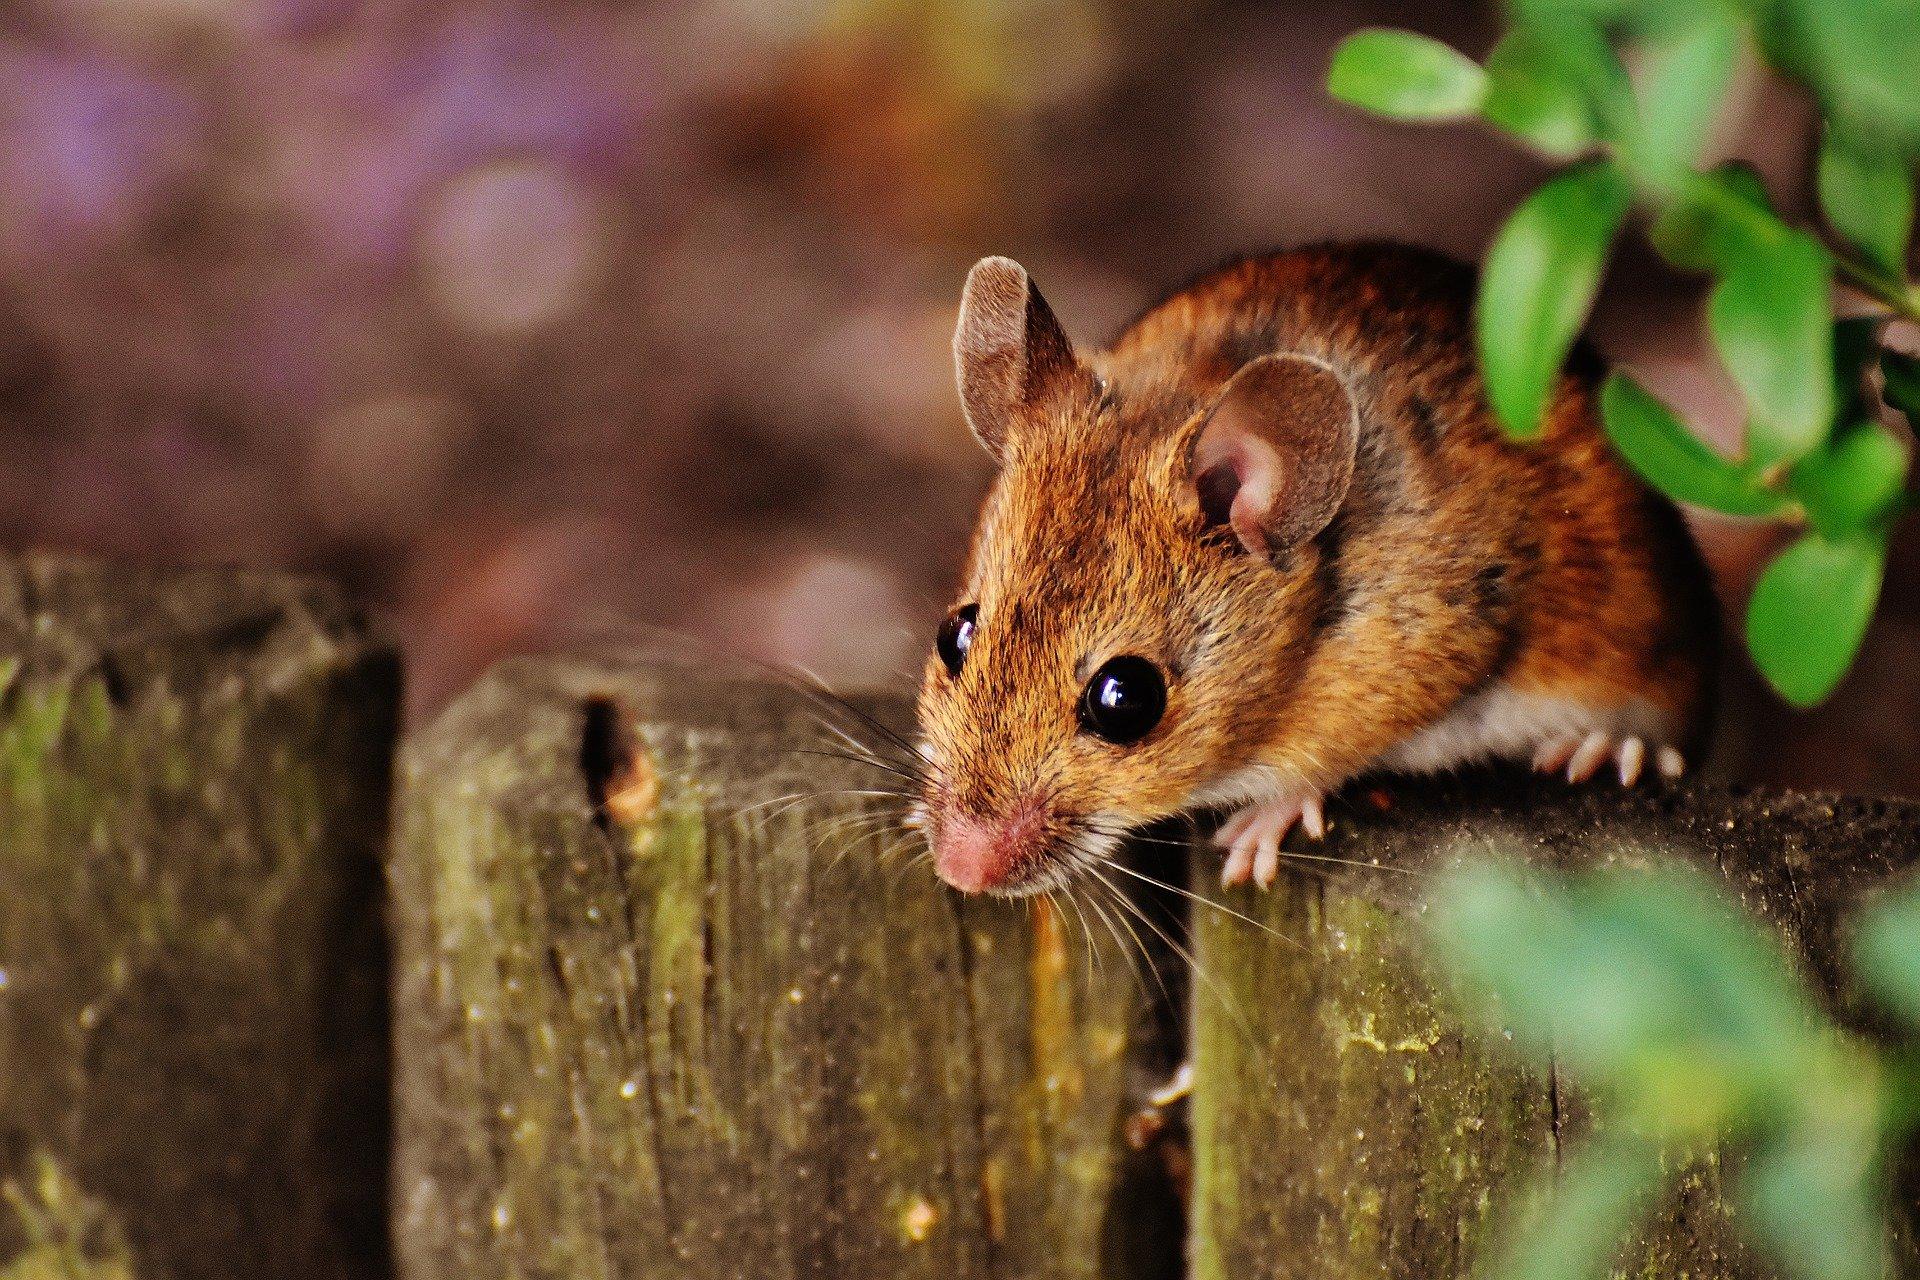 Treatment Restores Sociability In >> Scientists Tie Specific Brain Circuit To Sociability In Mice